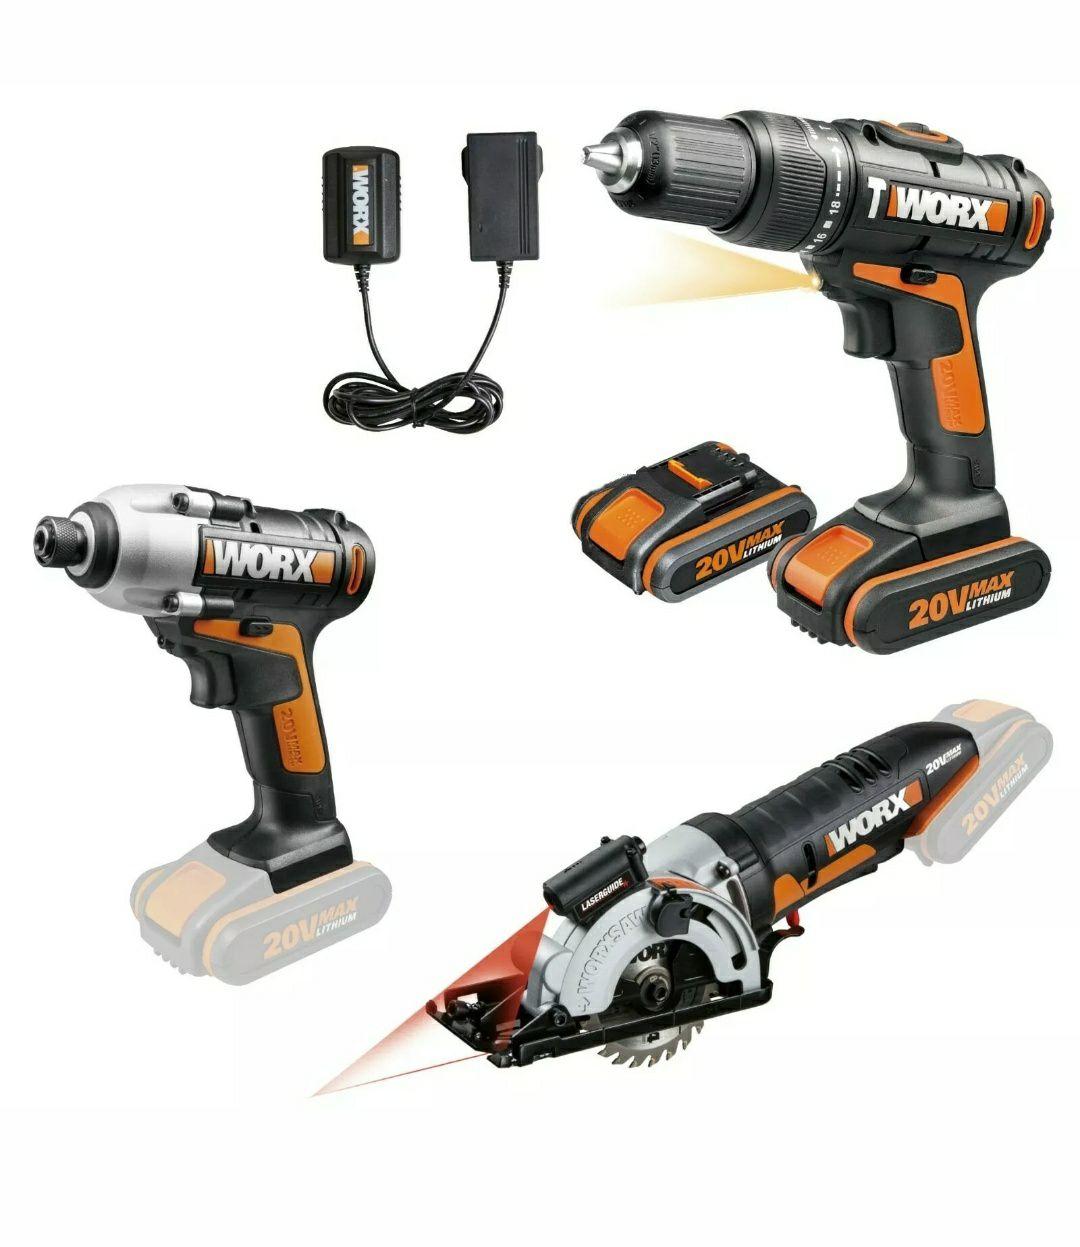 WORX WX933 18V DIY Tool Kit: Combi Drill, Impact Driver and Worxsaw £119.95 delivered @ positecworx eBay